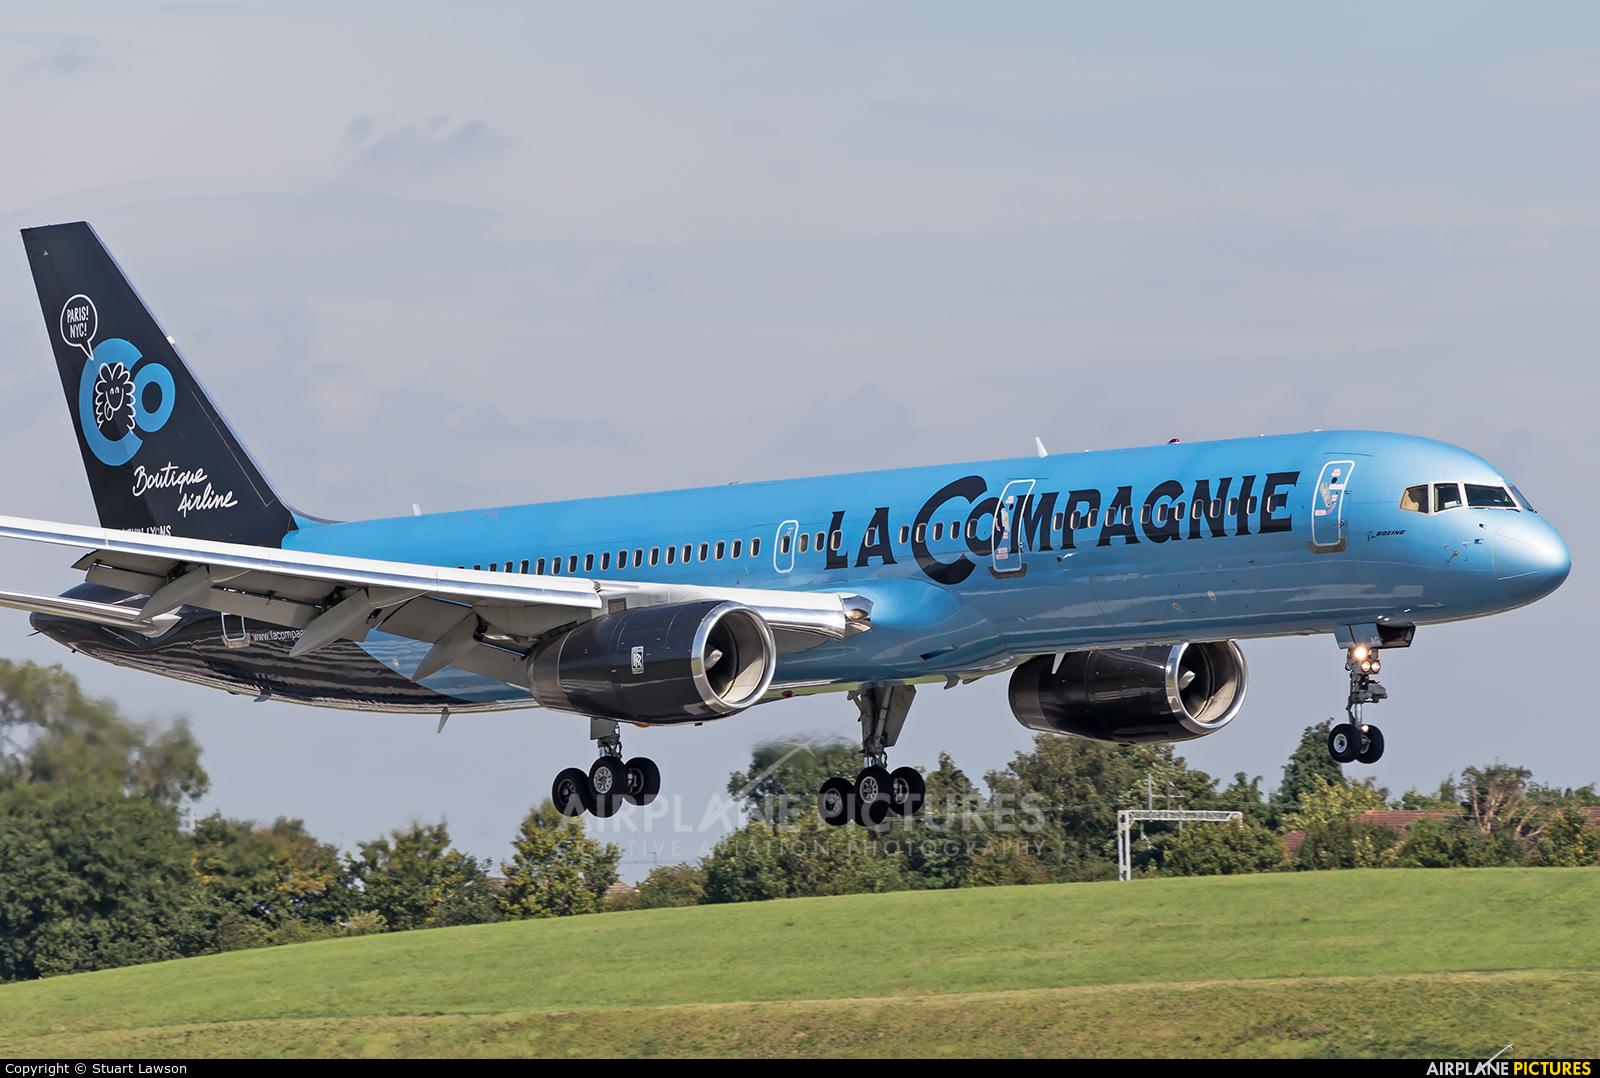 La Compagnie F-HTAG aircraft at Birmingham